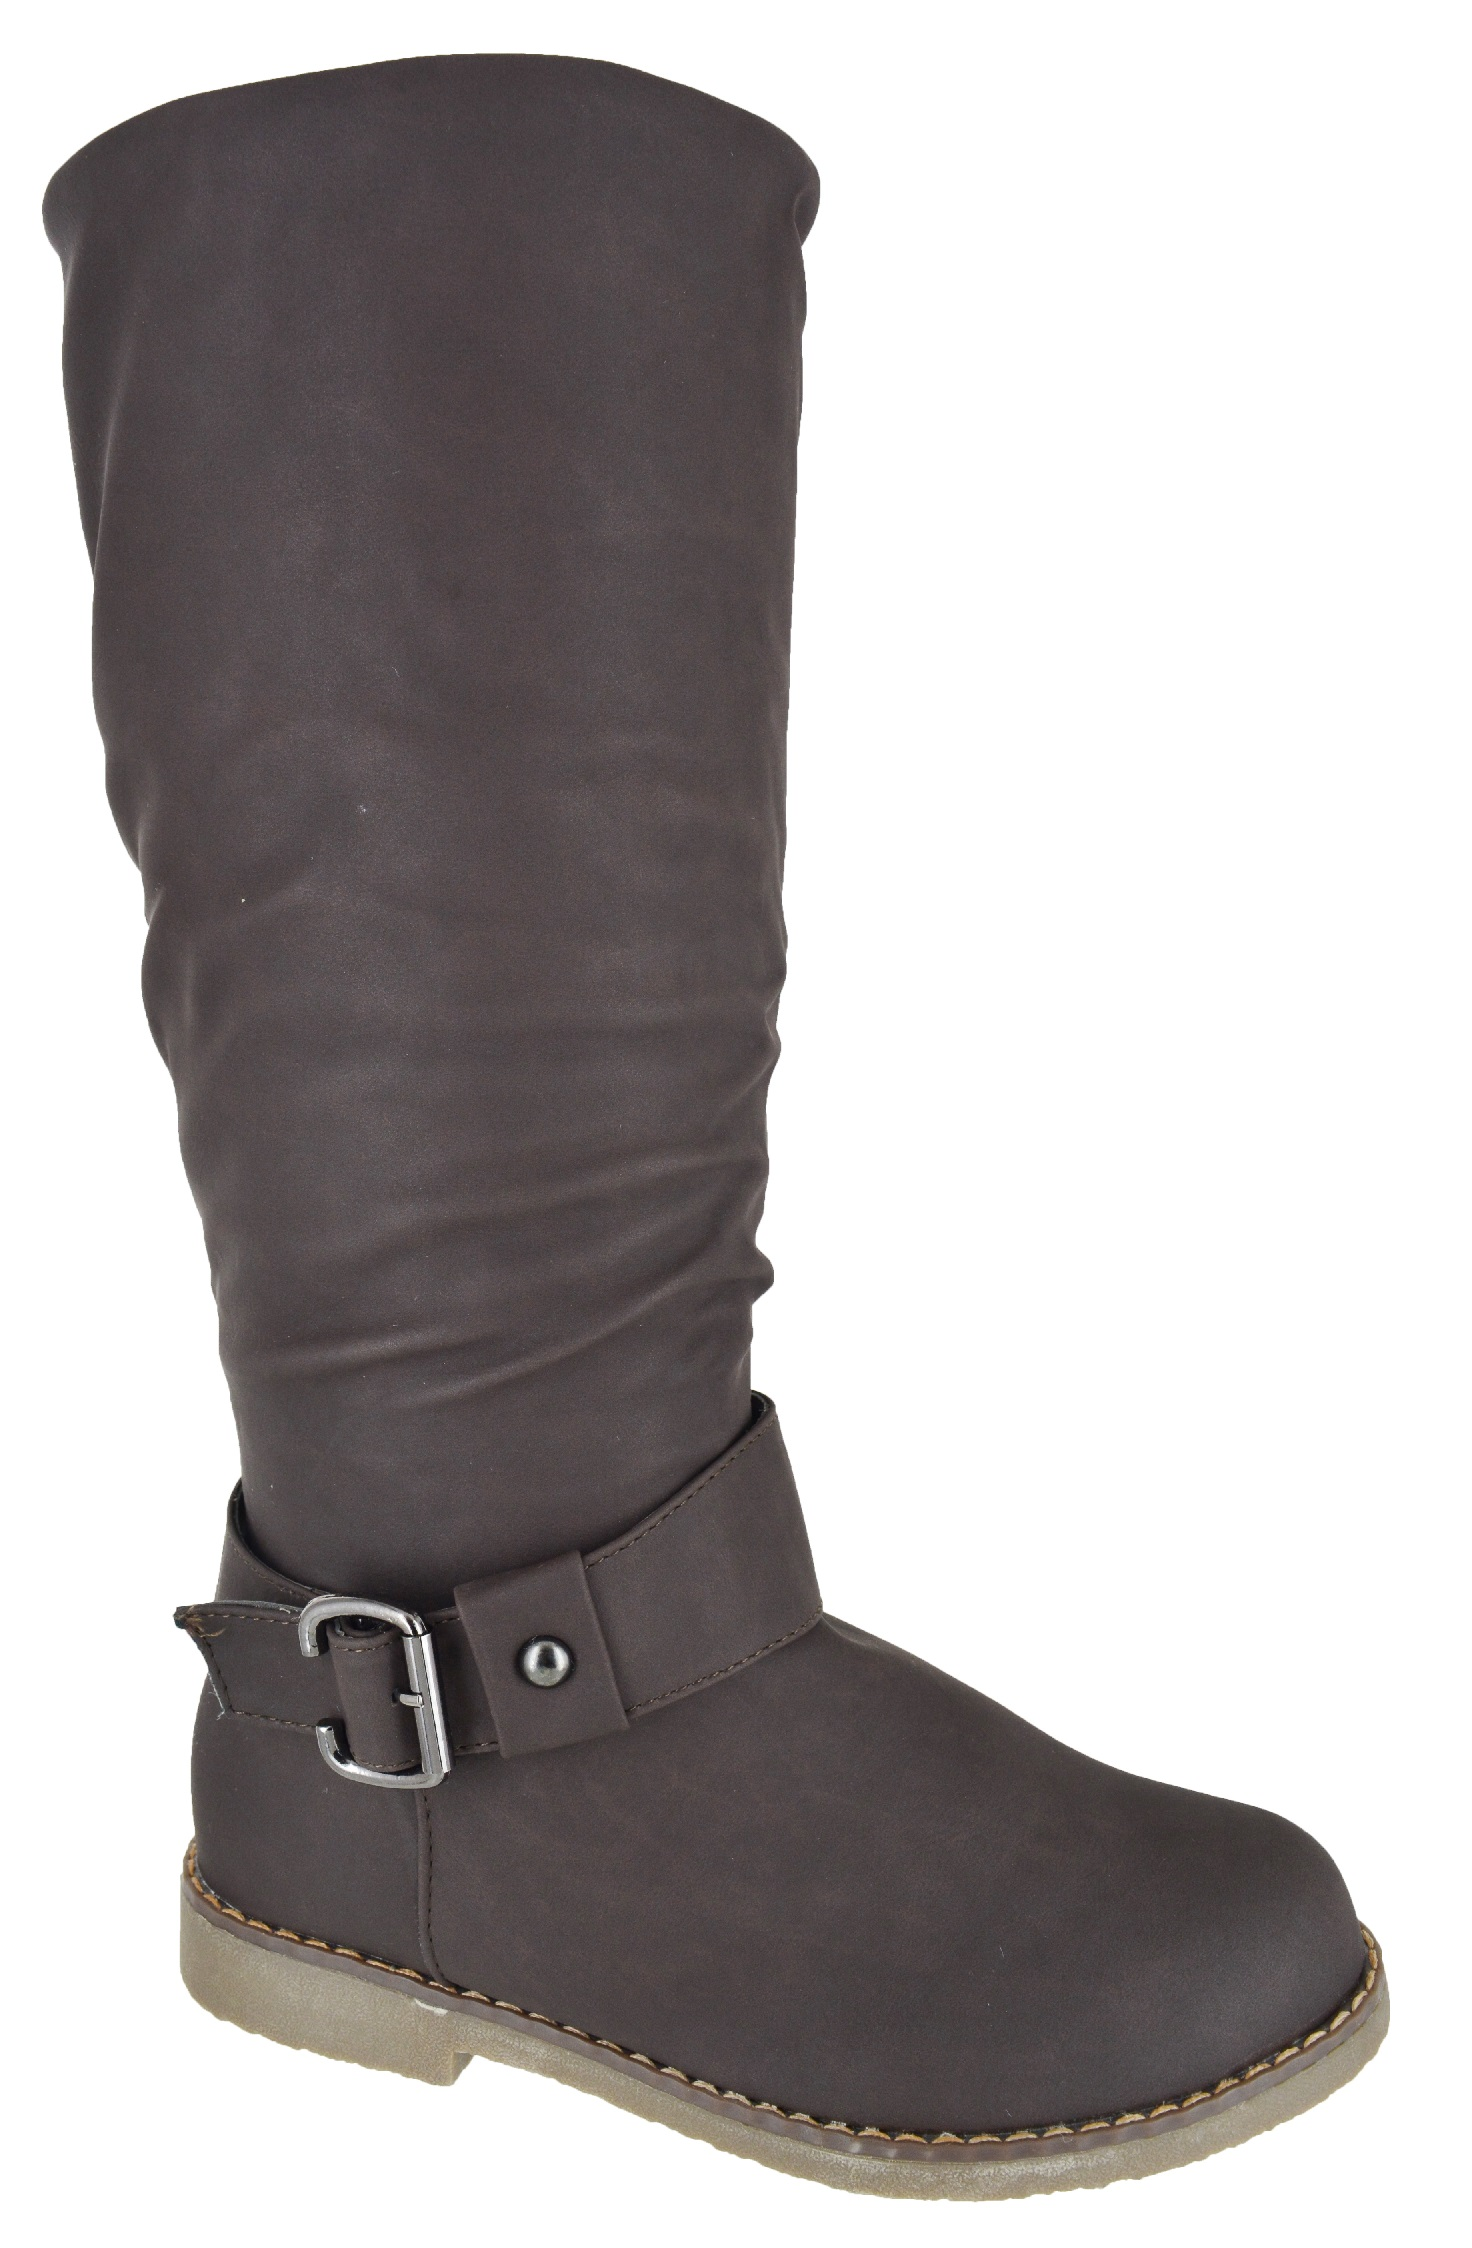 womens new flat knee high fur lined warm winter